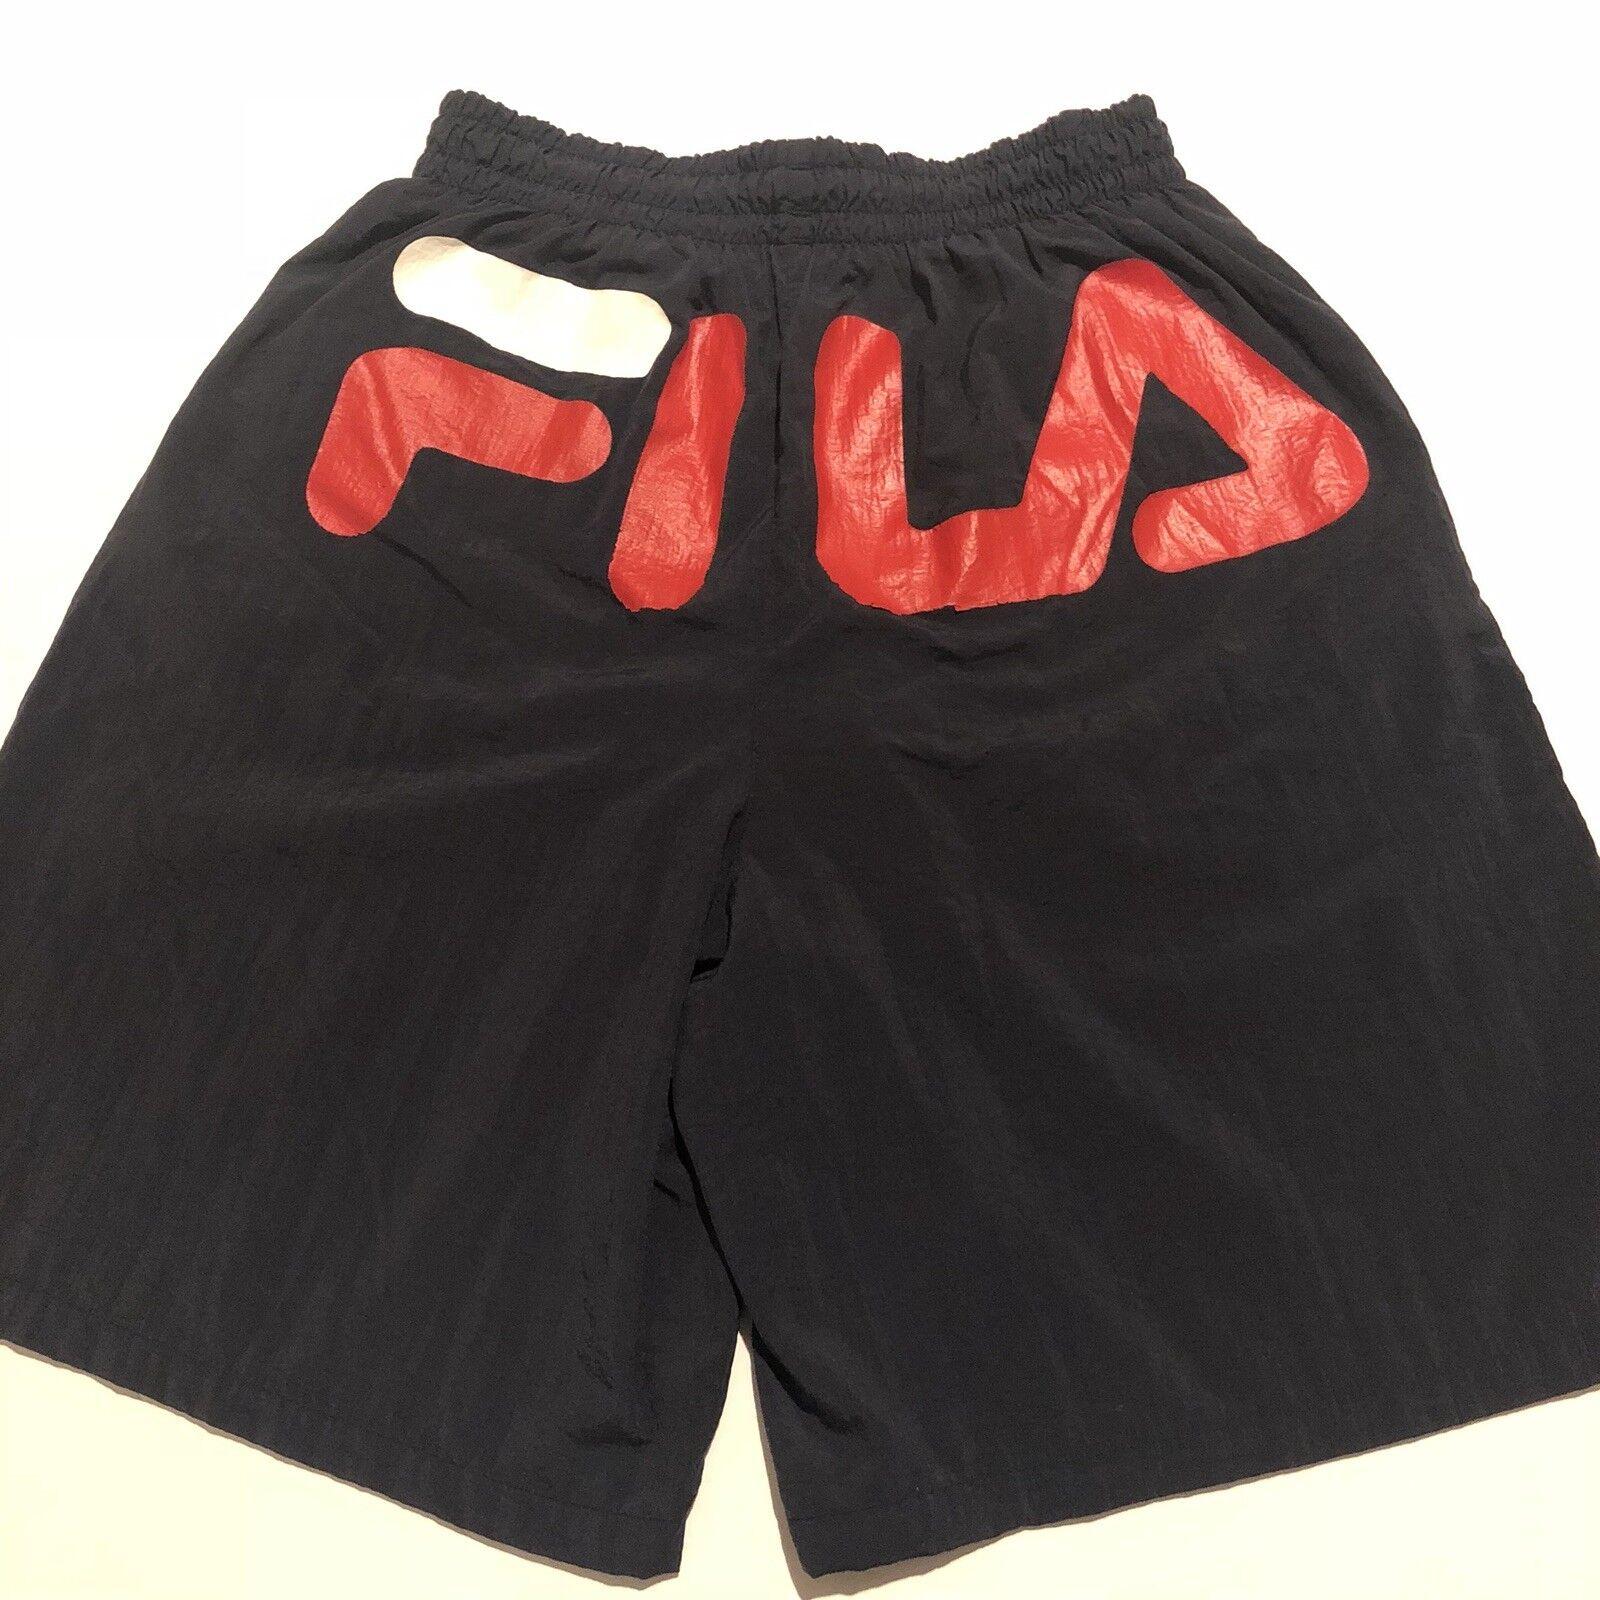 6cf388d271 Vintage Men's FILA Spellout Swim Trunks Shorts Beach RARE Medium Board  nnpxaa4183-Swimwear